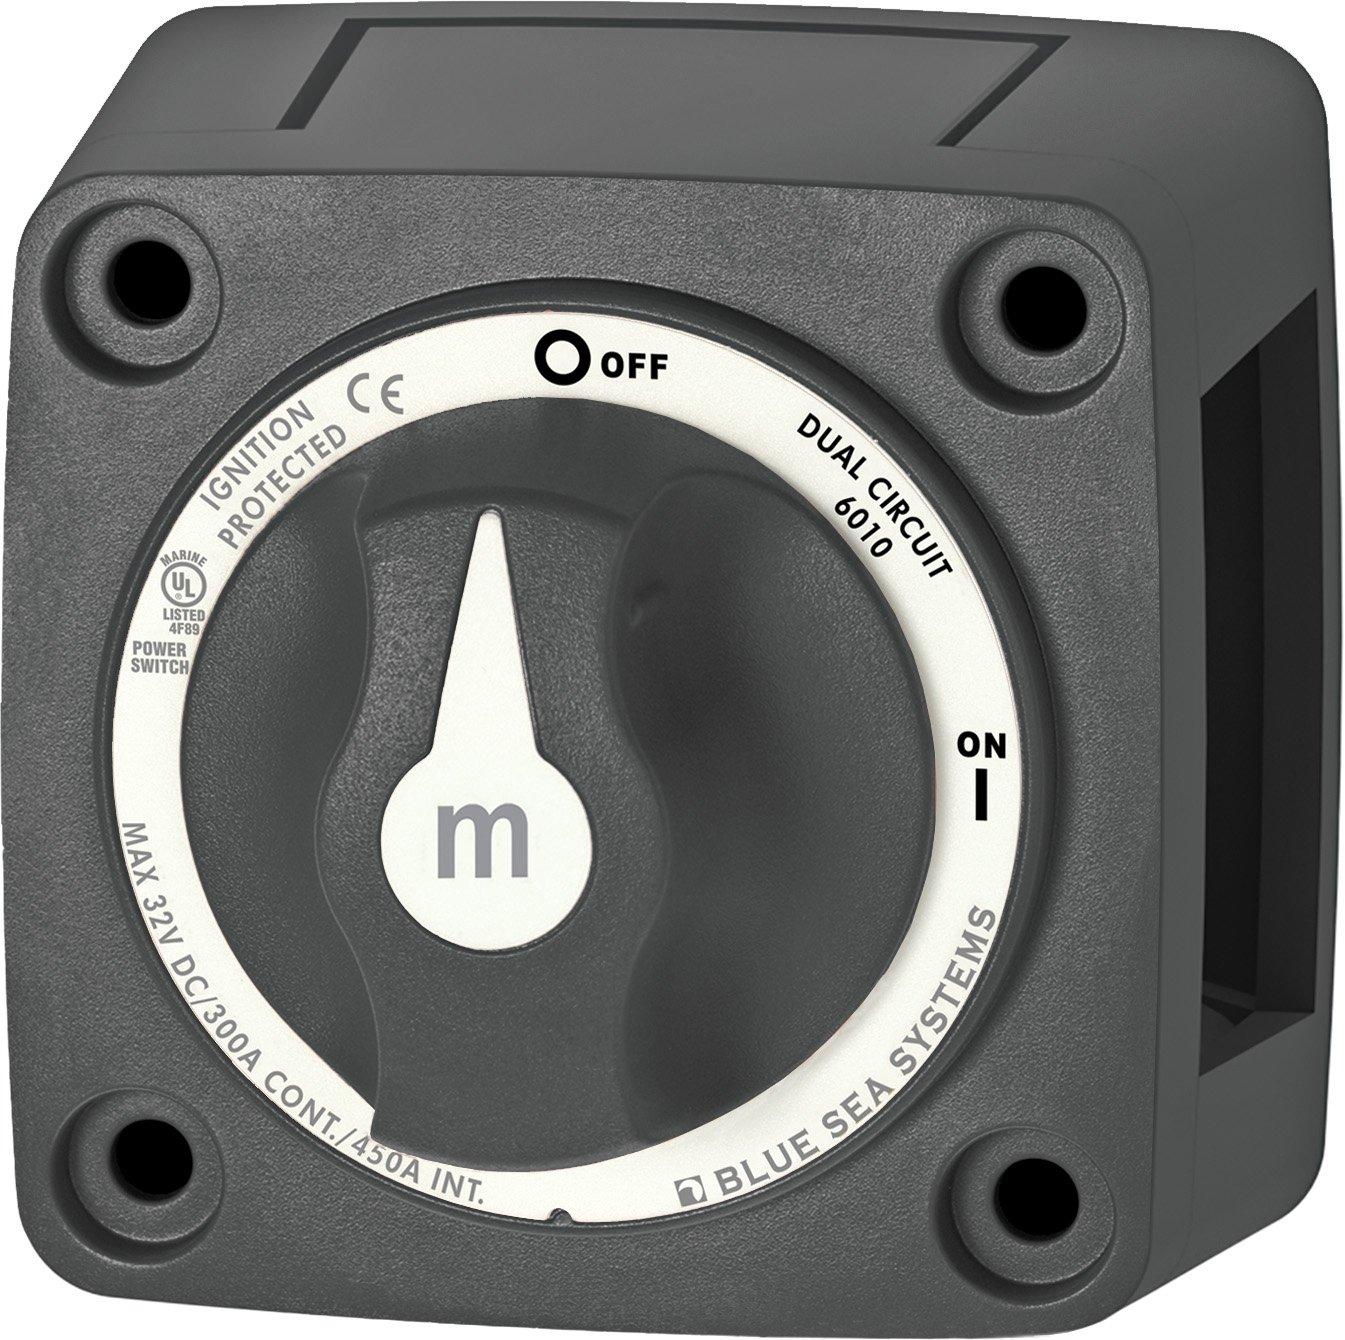 Amazon.com: Blue Sea Systems m-Series Mini Dual Circuit Battery ...